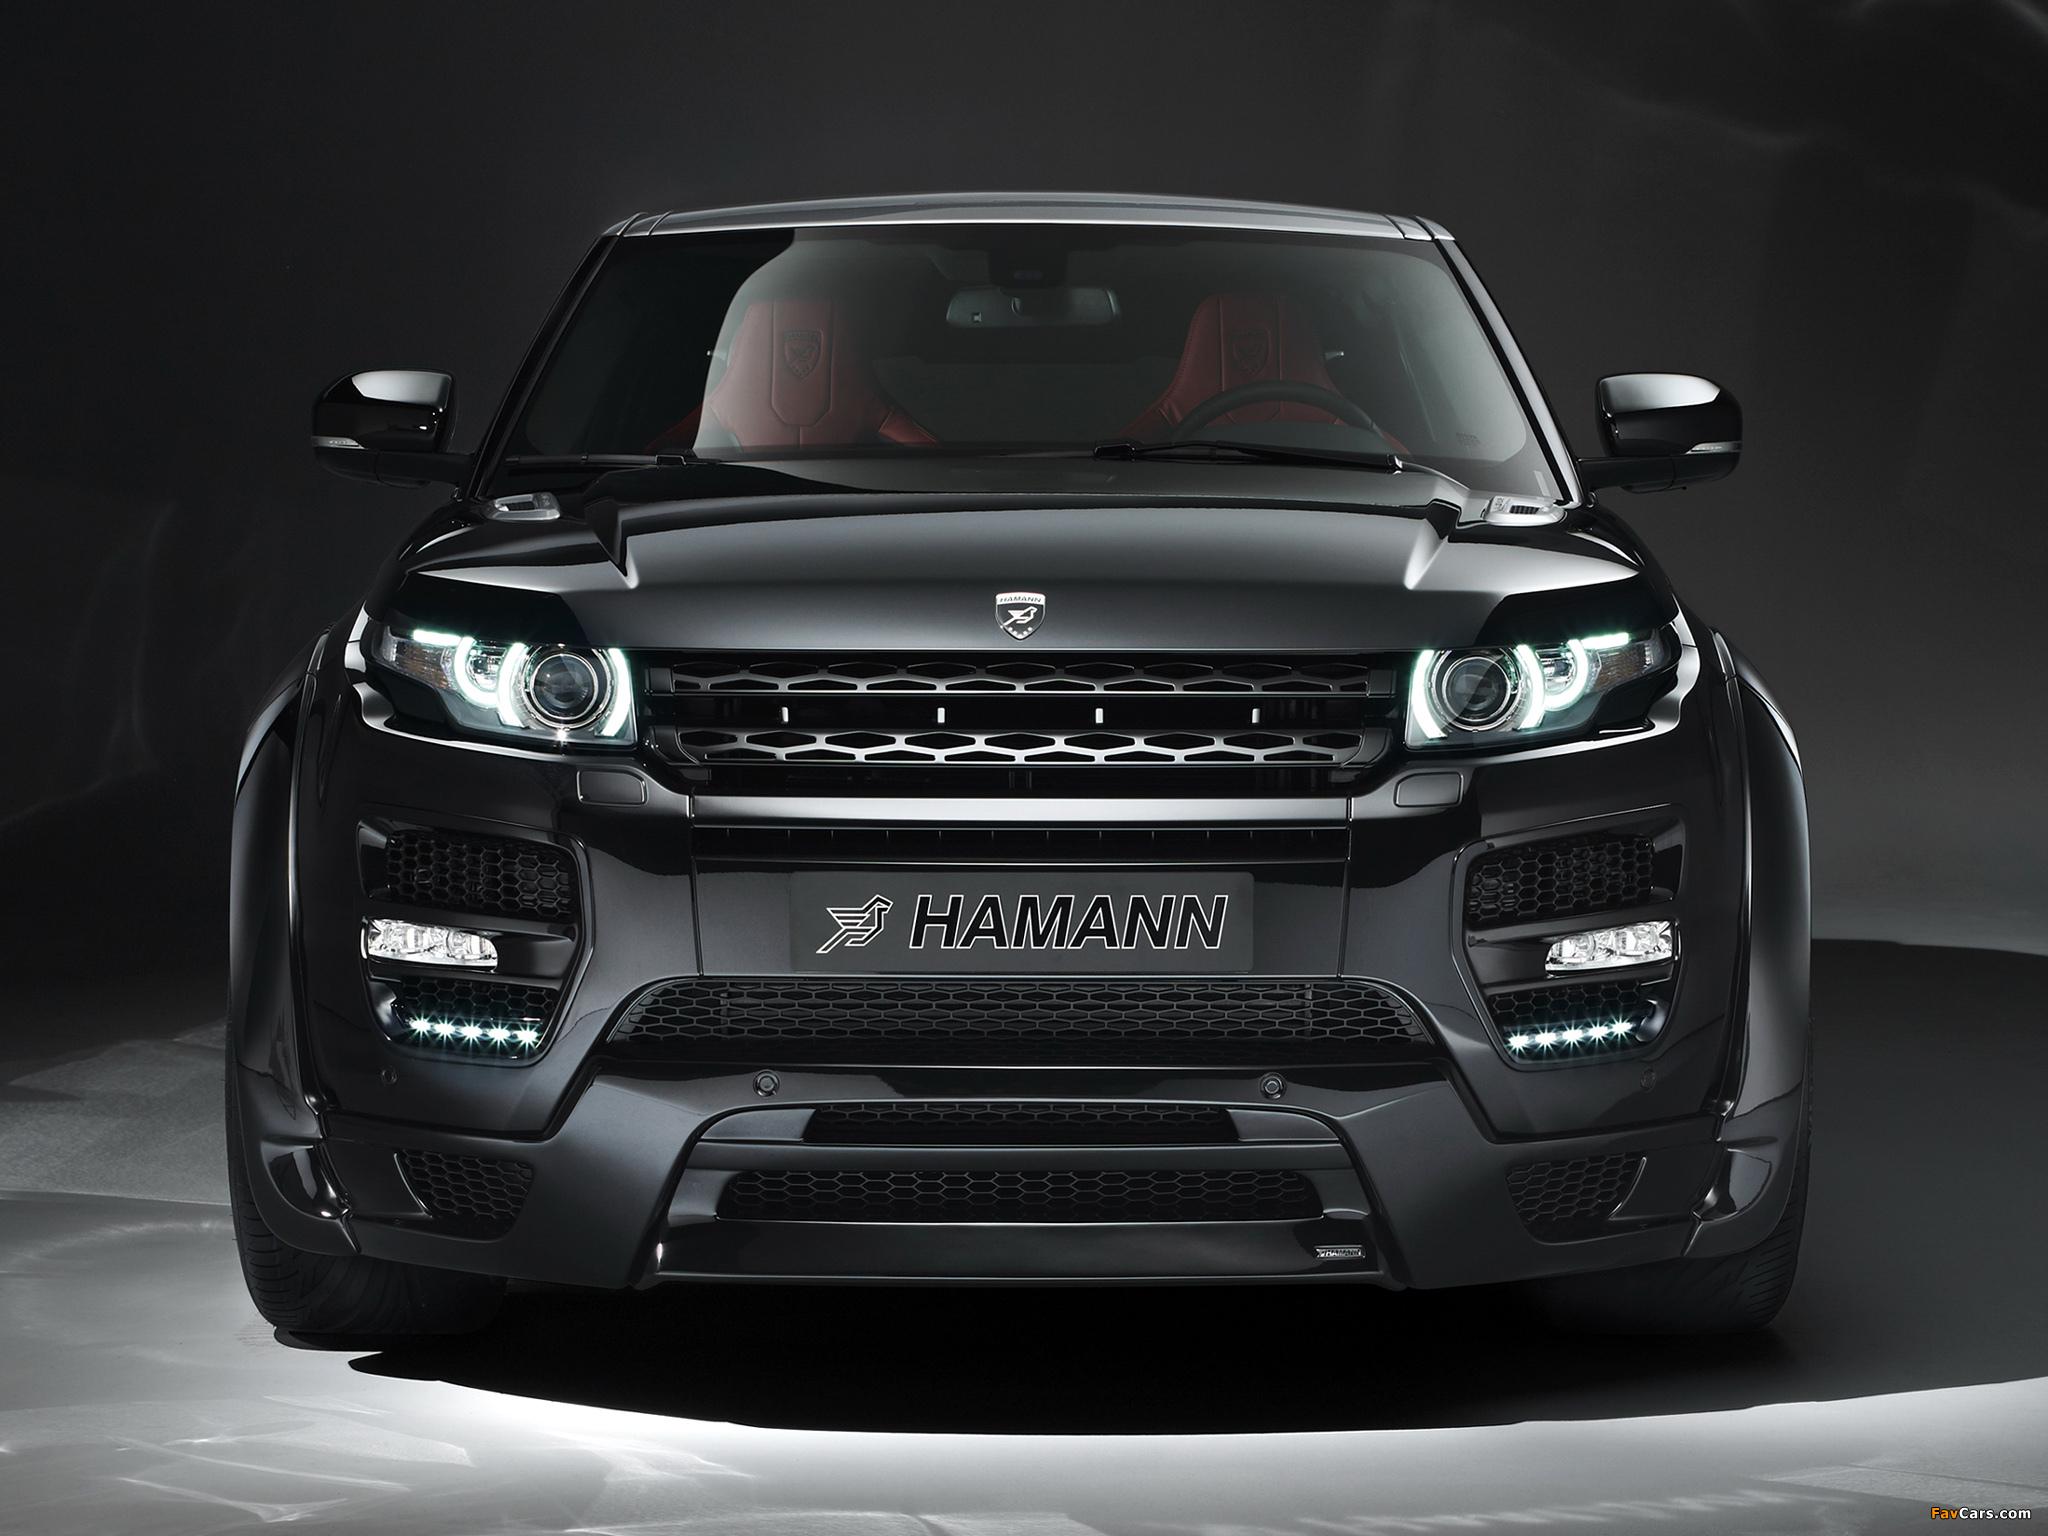 Hamann Range Rover Evoque Coupe 2012 images (2048 x 1536)